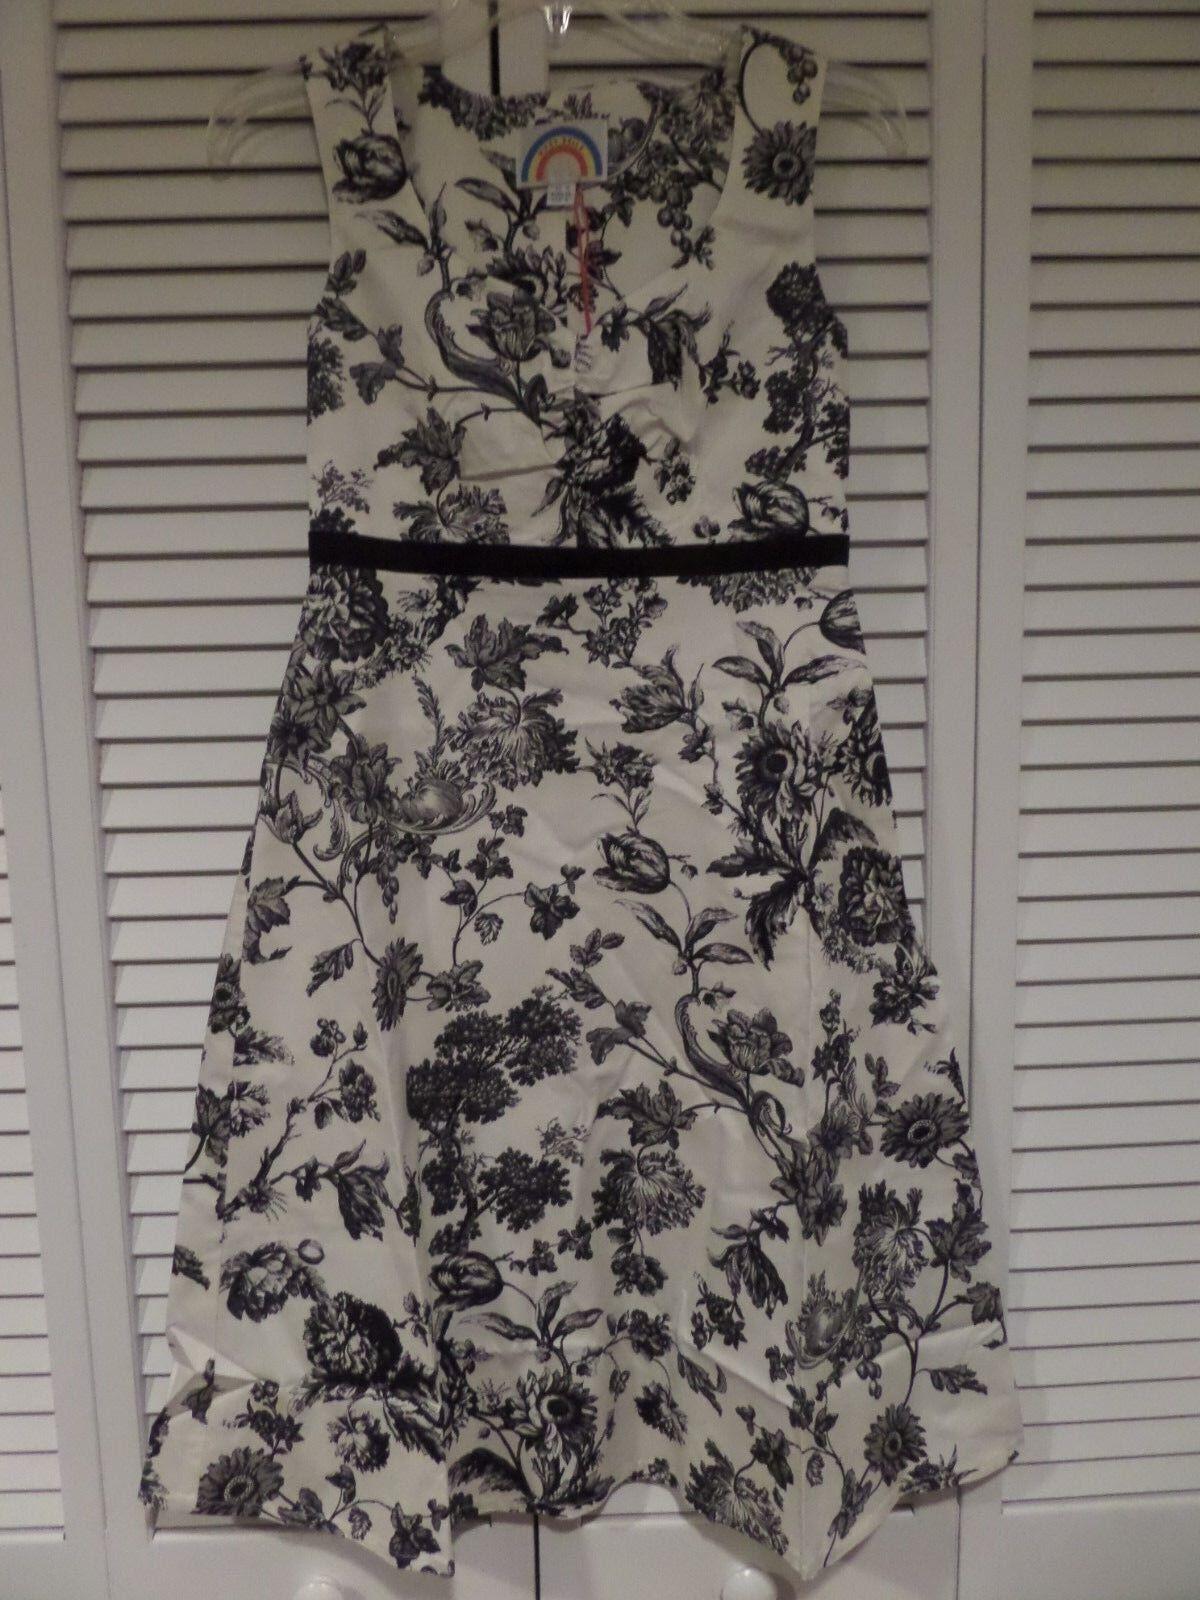 NWT Ruby Belle Lithco Sweetheart Dress schwarz Weiß Sz 6 US () Must Read HOT